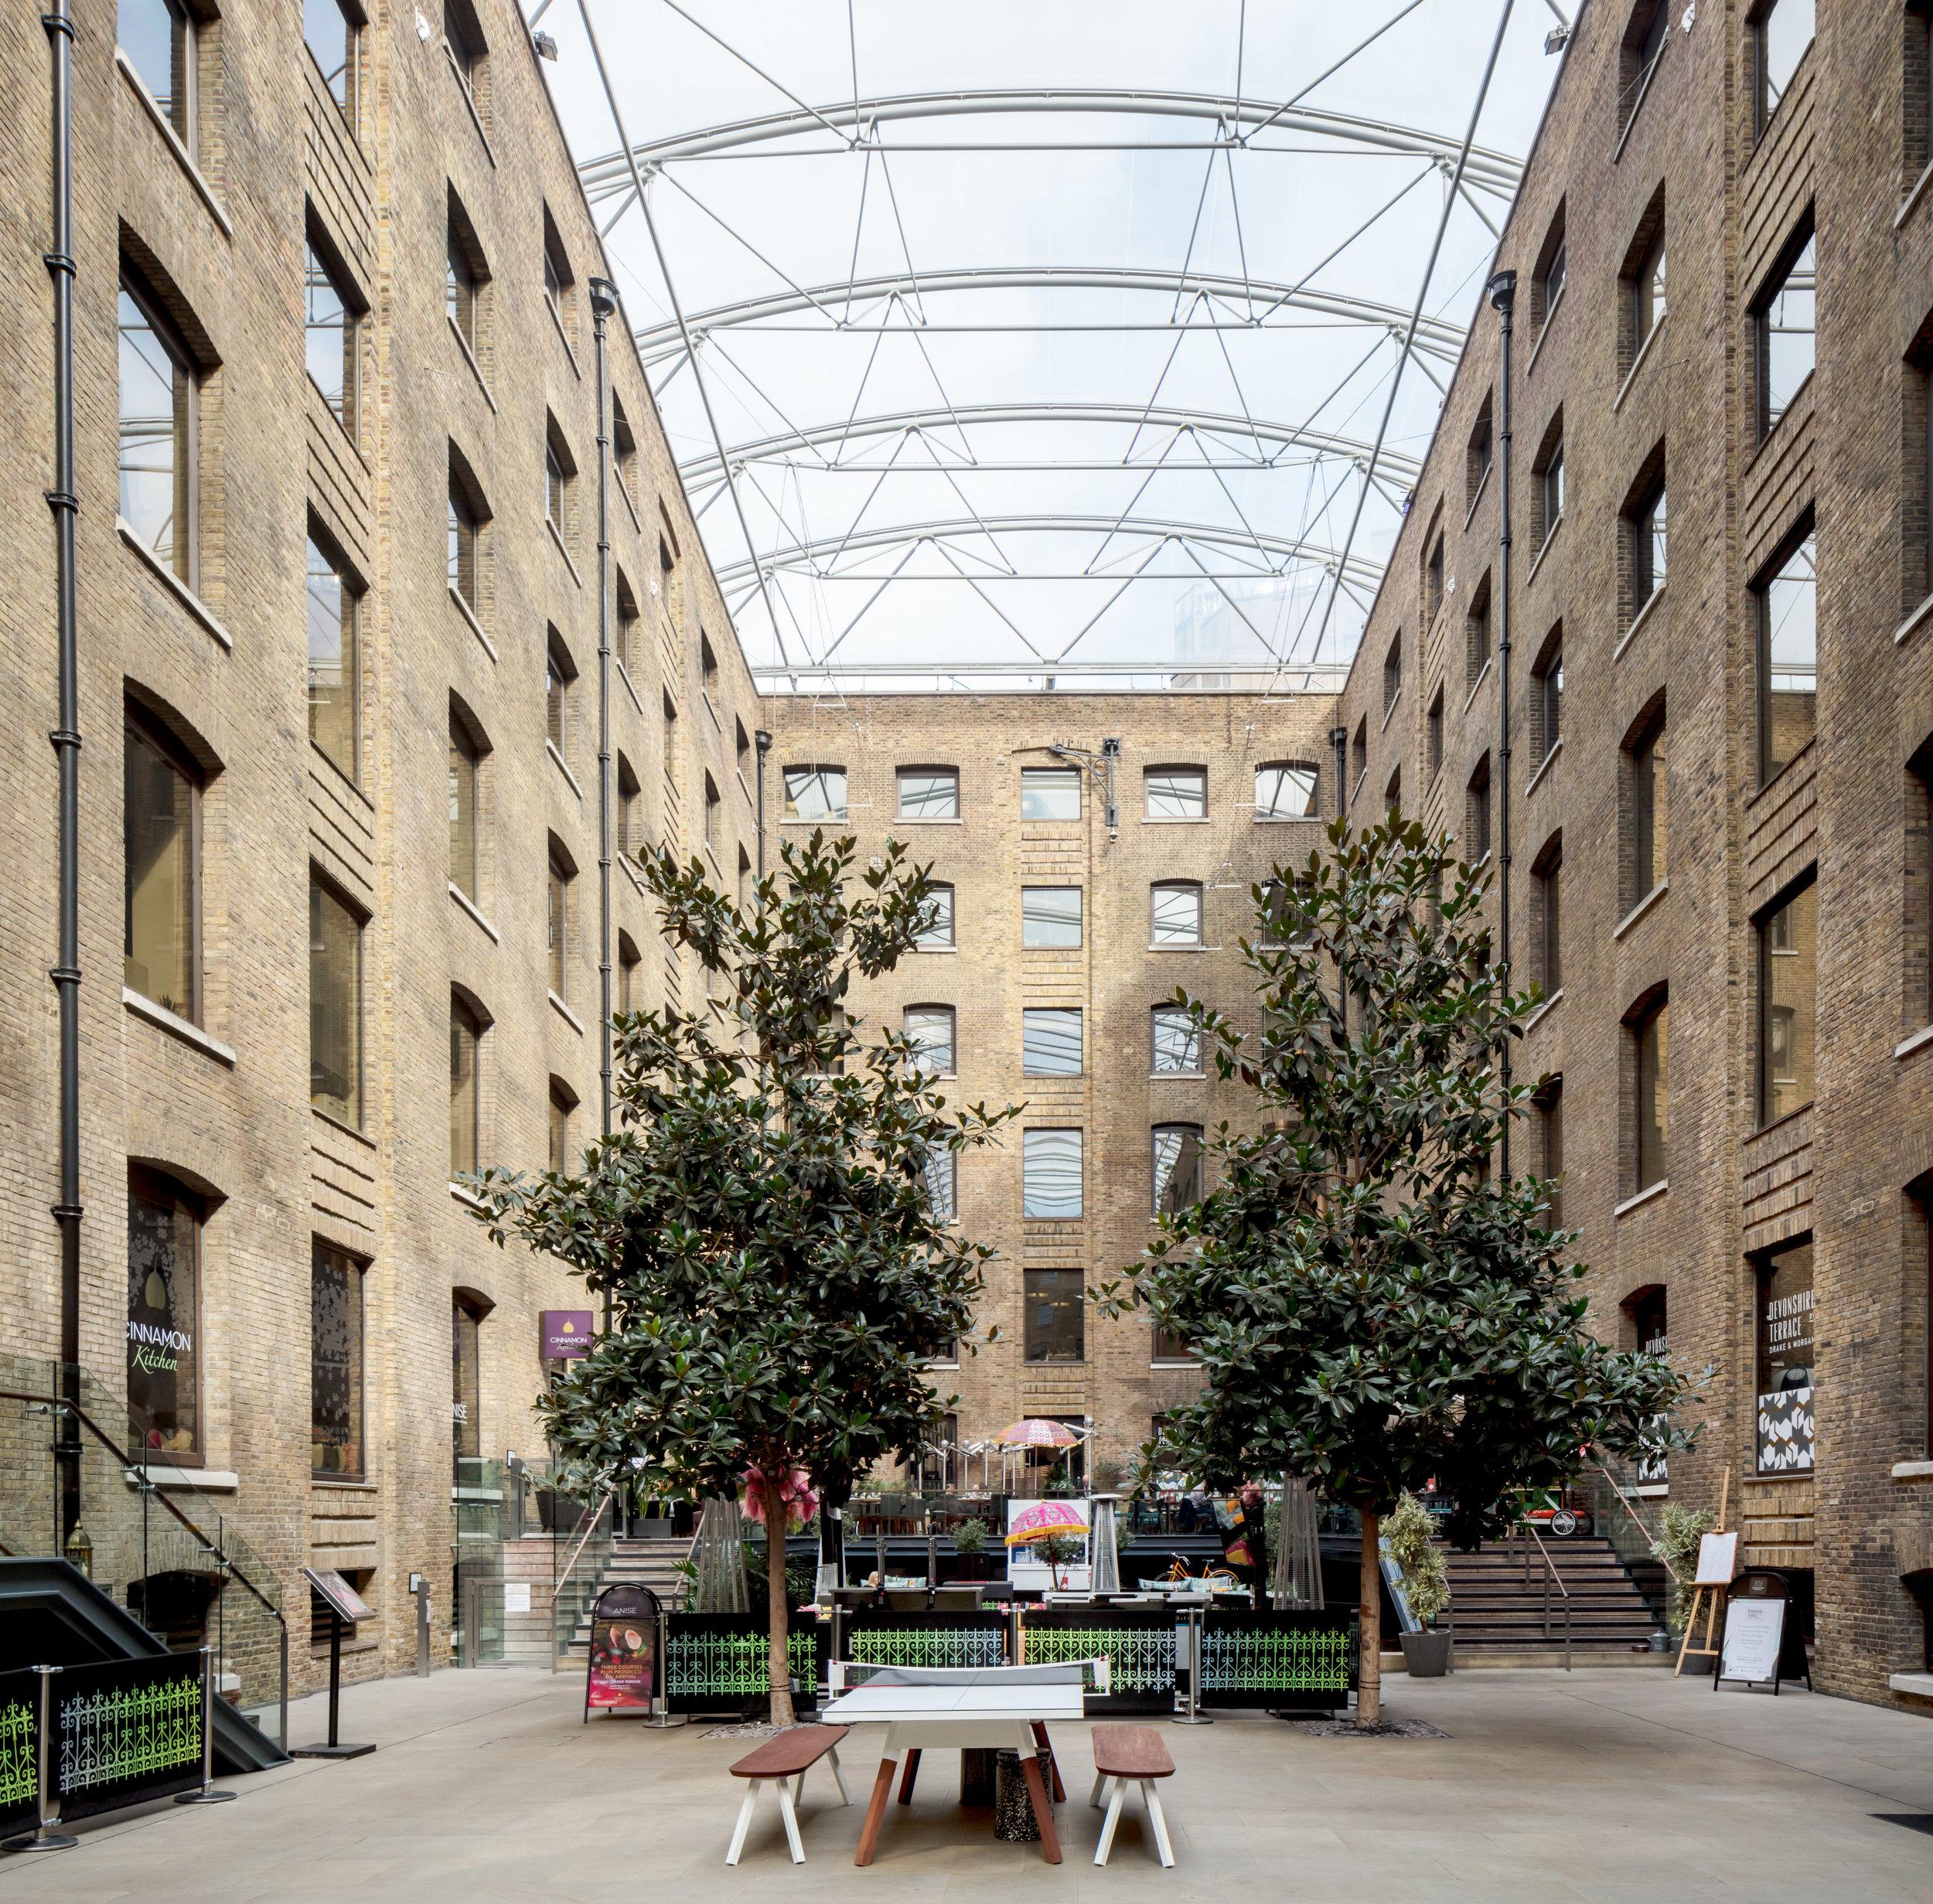 20180914_London_8-Devonshire-Square_Exteriors_Campus_01.jpg